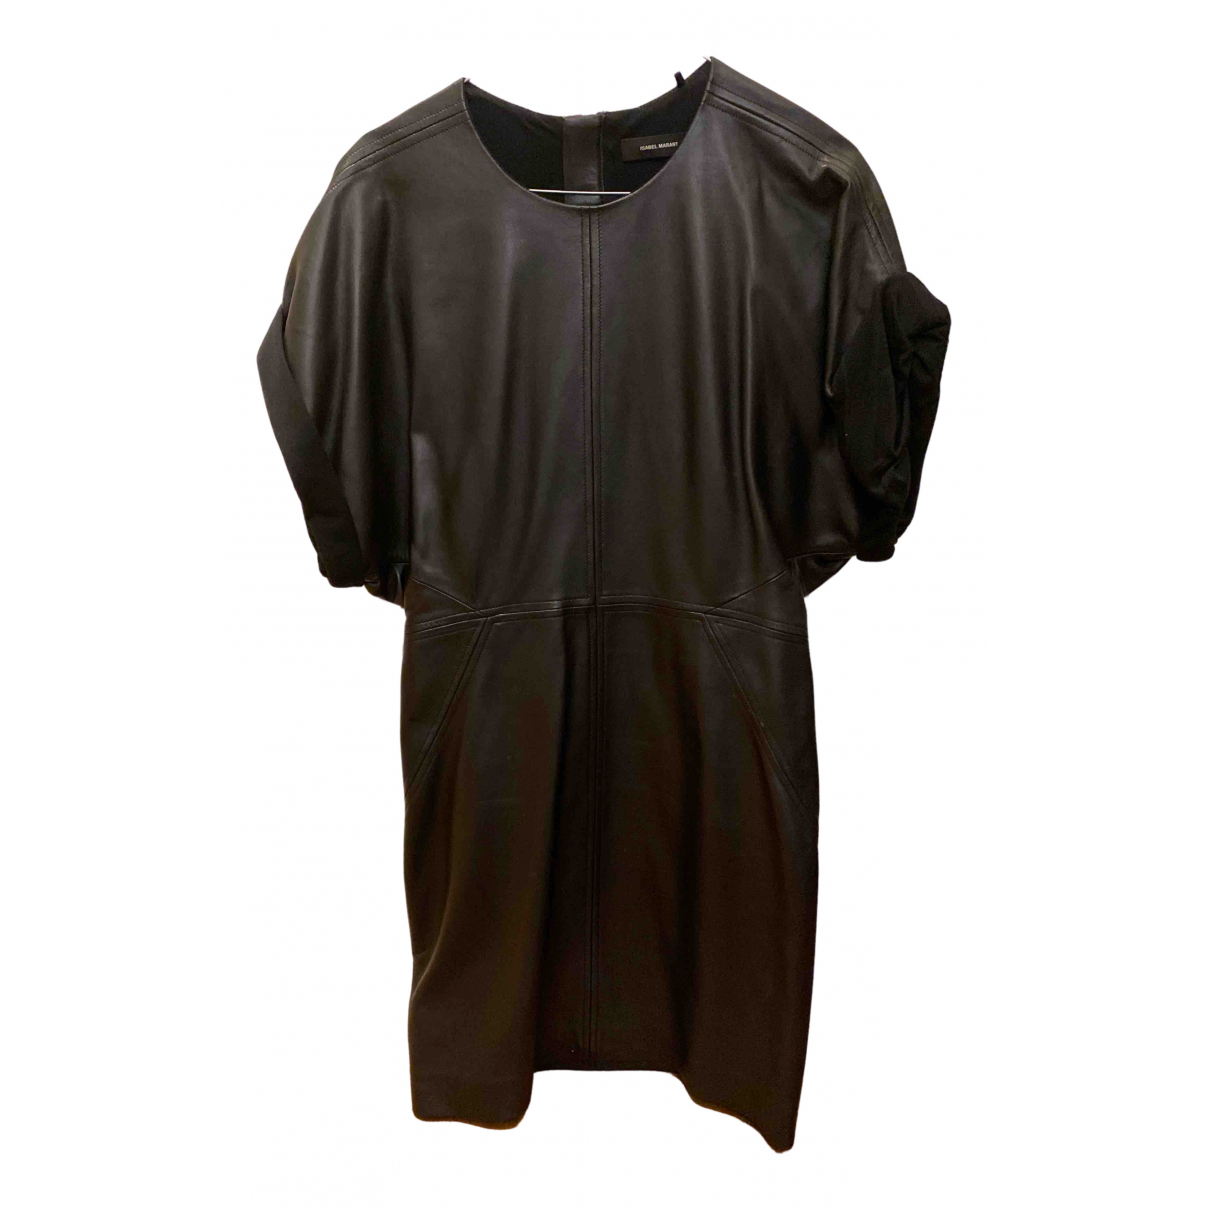 Isabel Marant N Black Leather dress for Women 38 FR